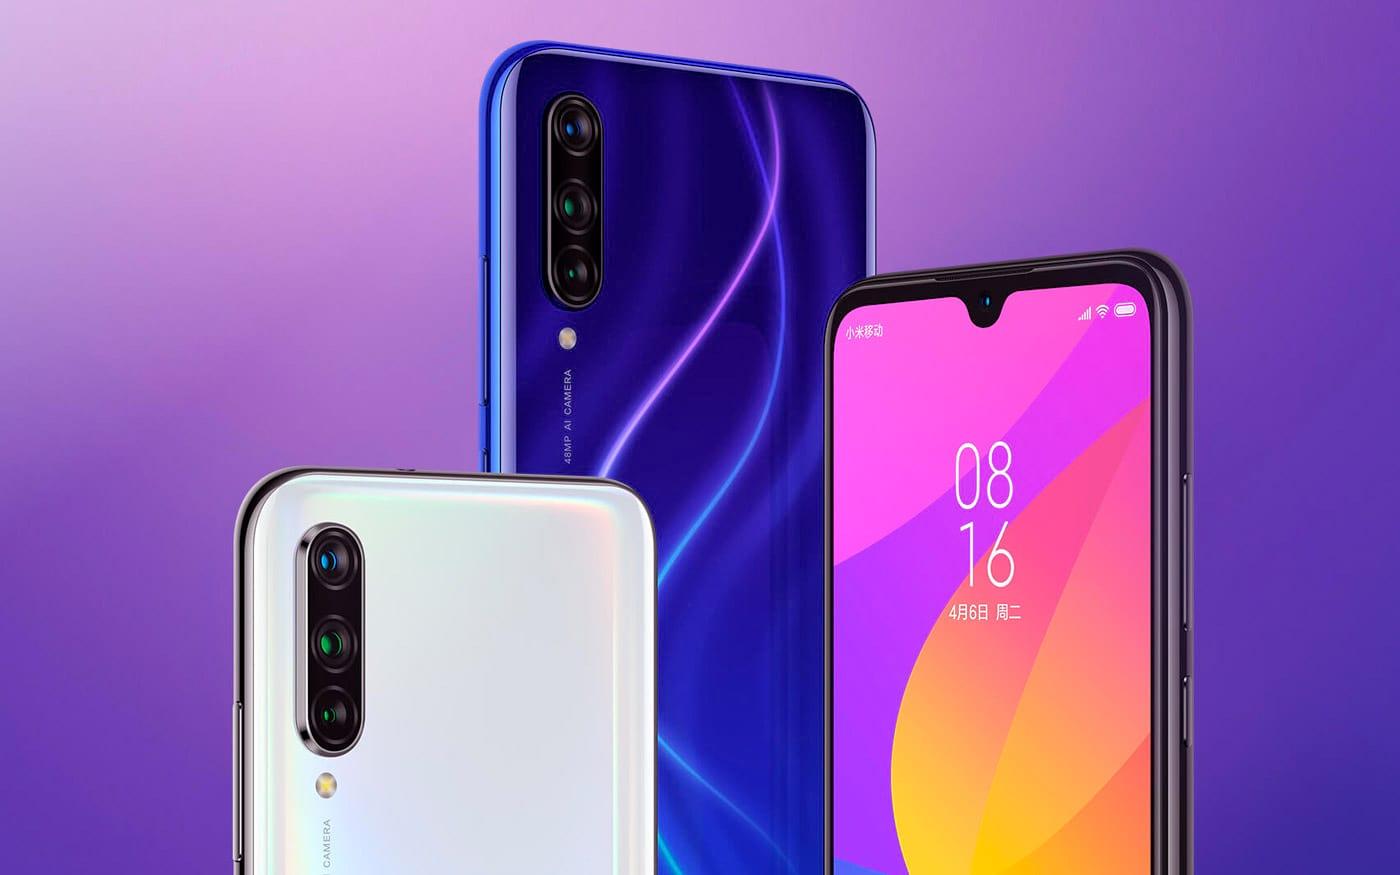 CONFIRMADO! Xiaomi Brasil vai começar vender oficialmente o MI A3